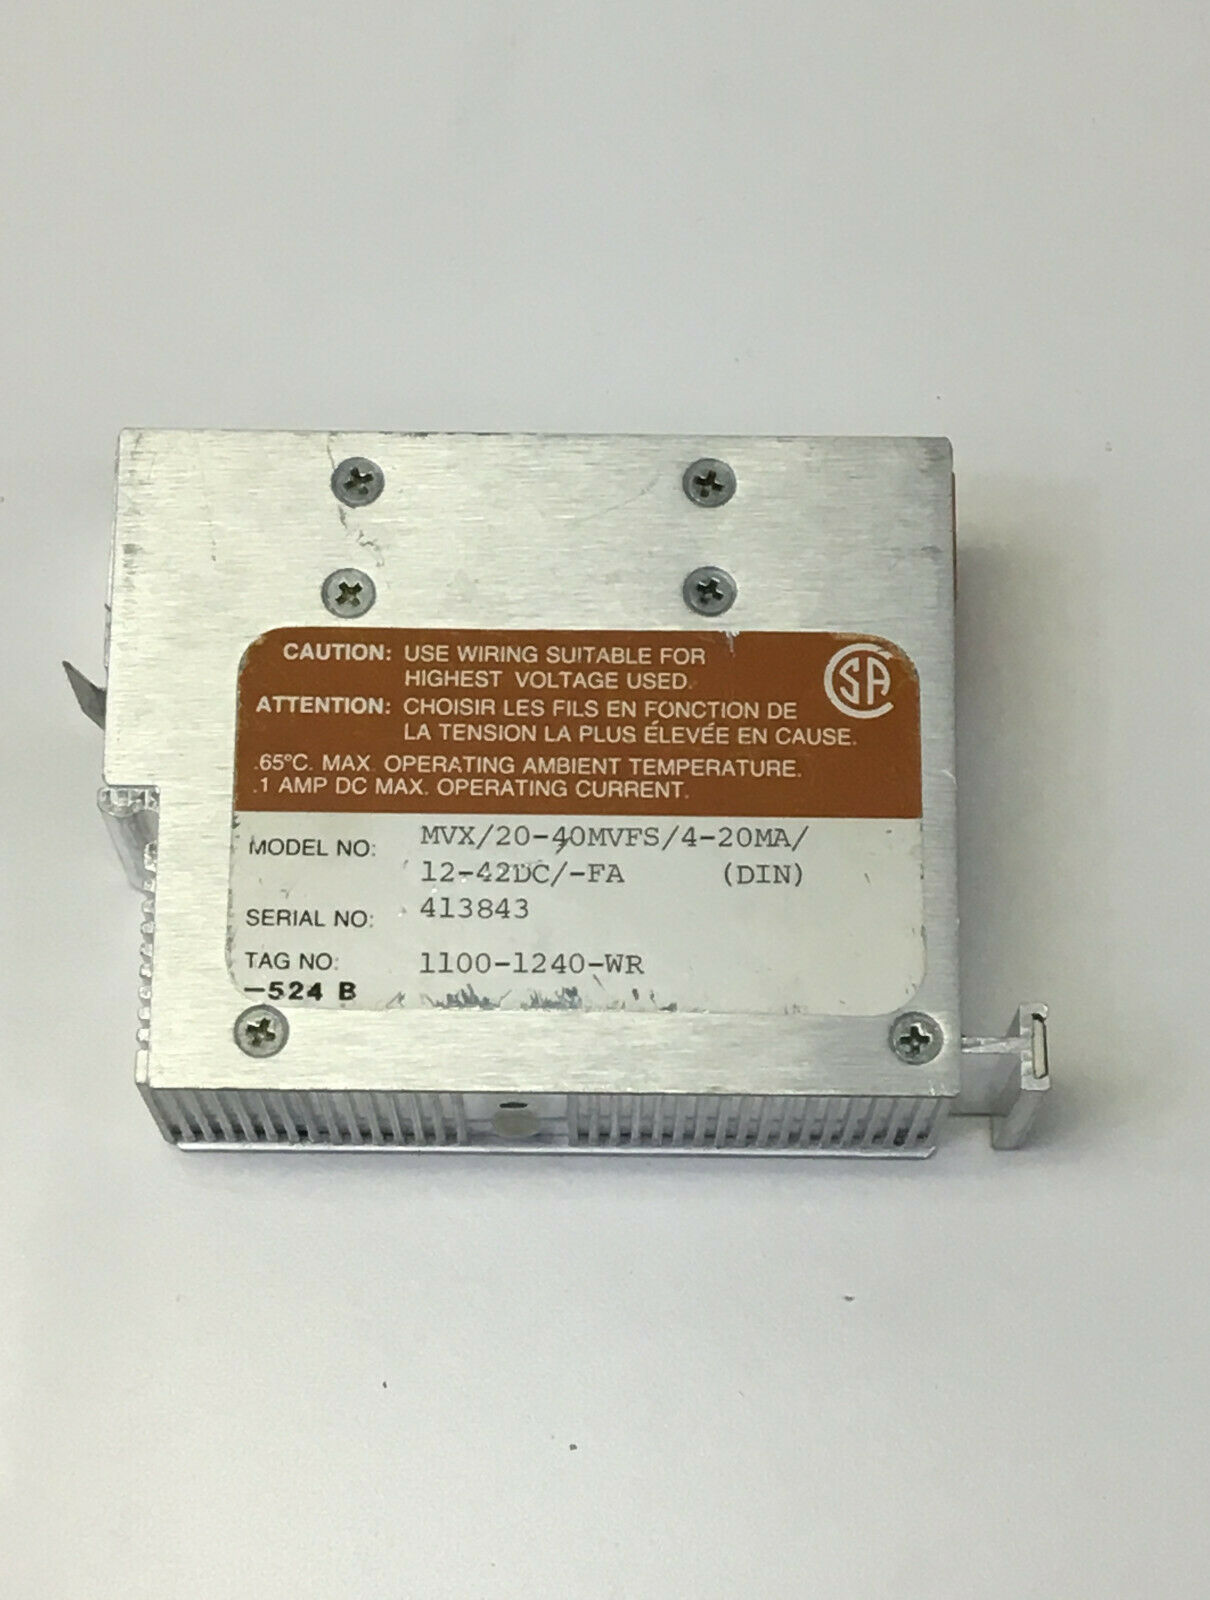 Moore  MVX 20-40MVFS 4-20MA 12-42DC -FA Millivolt Transmitter